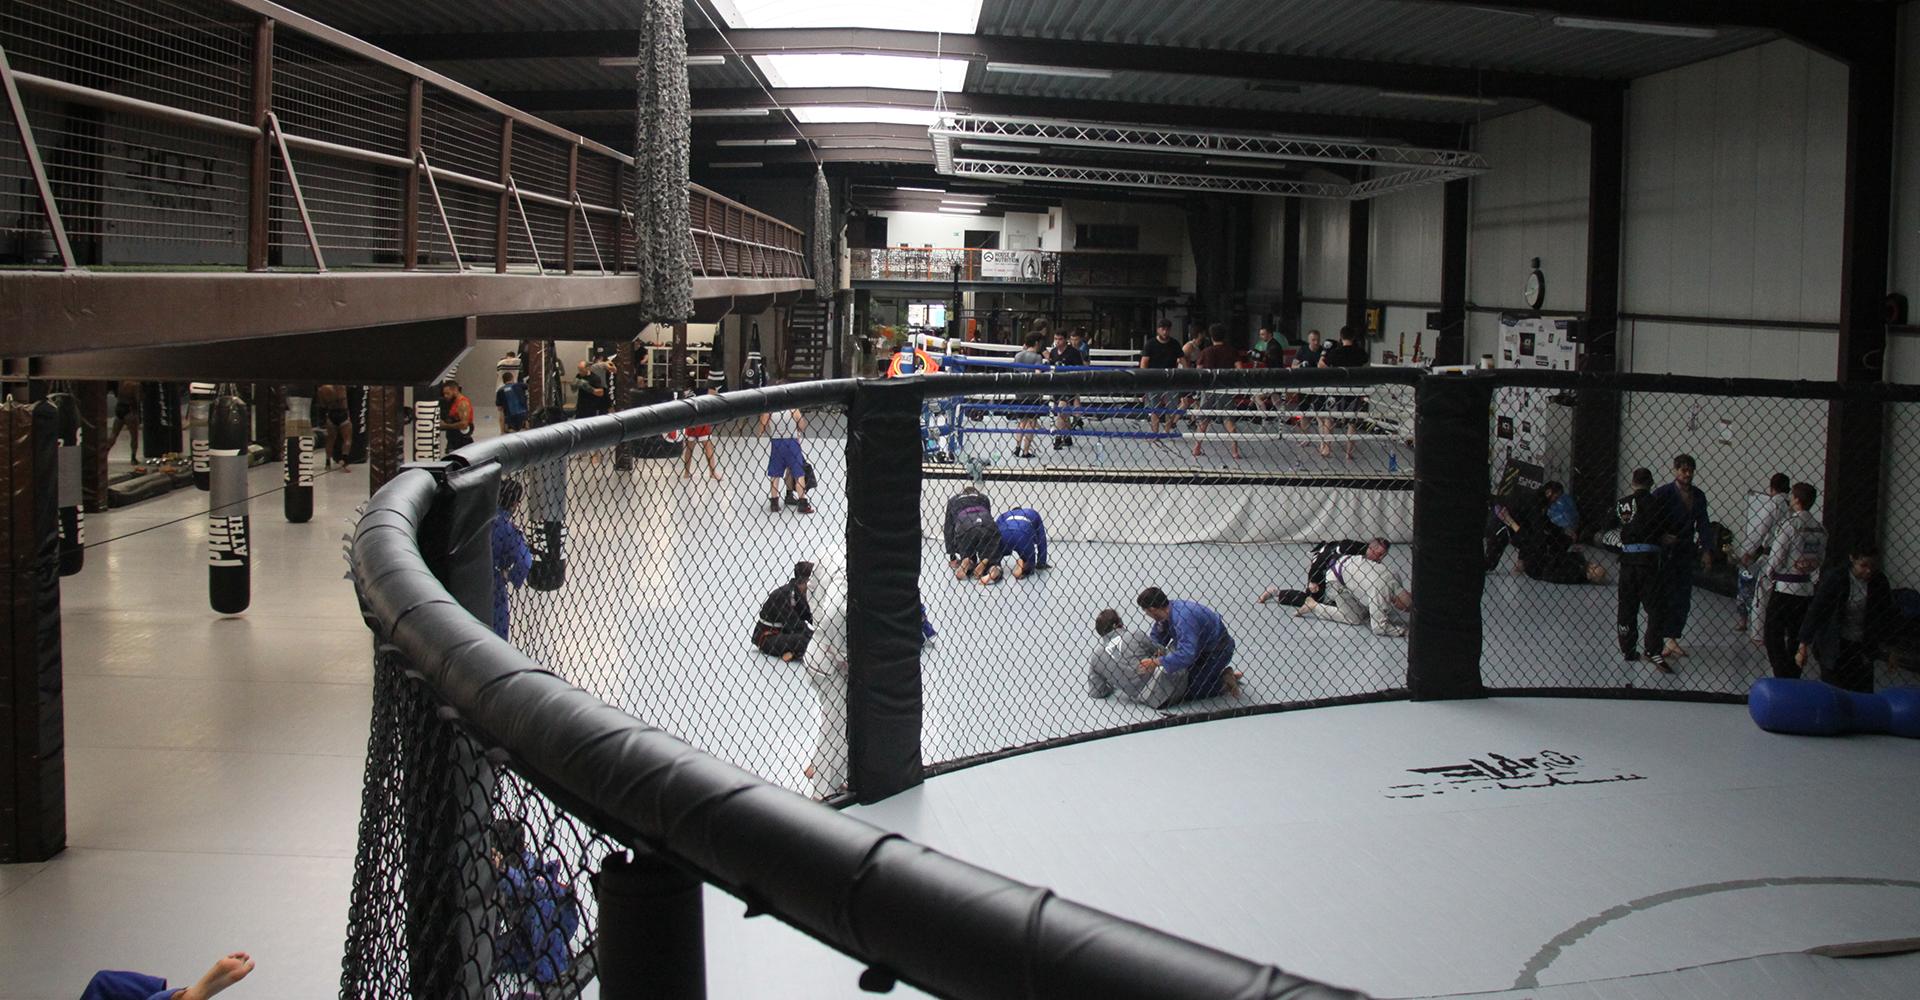 Shocx Mma Salle De Sport Boxe Jiu Jitsu A Bruxelles